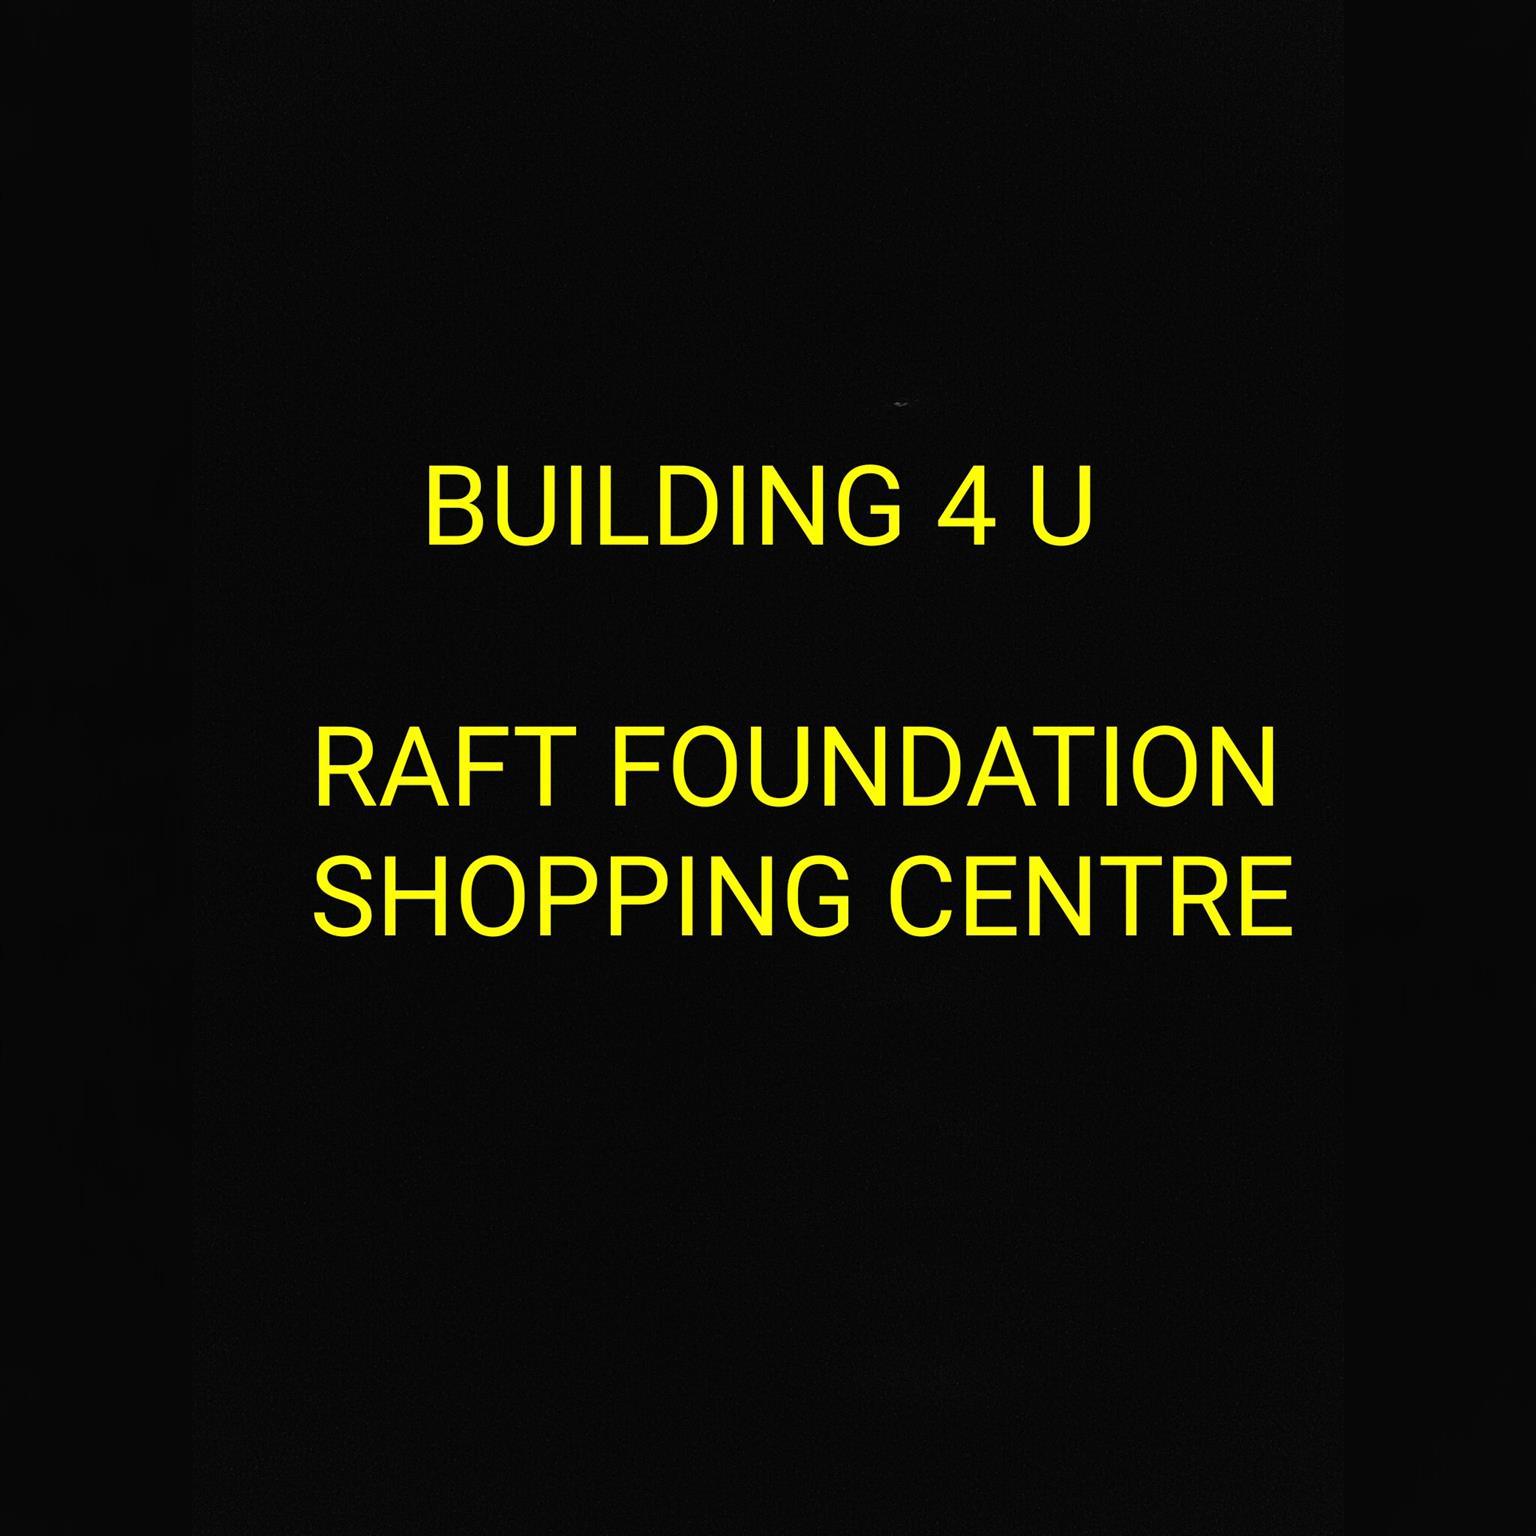 Shopping centre raft foundation building 4 u